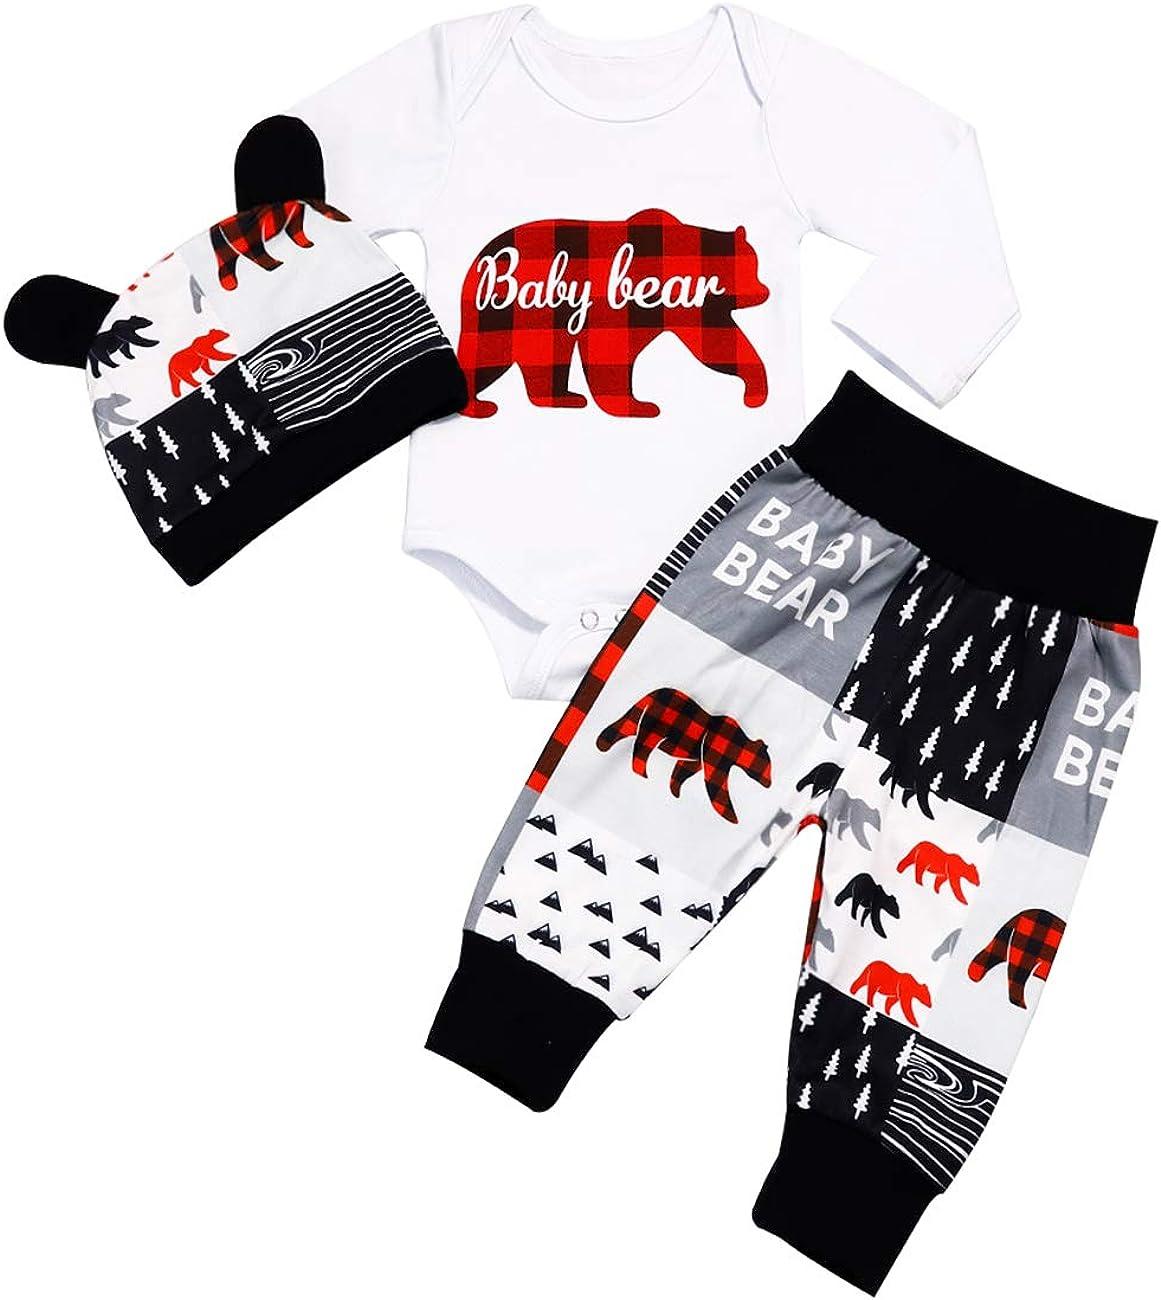 Newborn Baby Boy Girl Clothes Baby Bear Letter Print Romper+Long Pants+Hat 3PCS Outfits Set